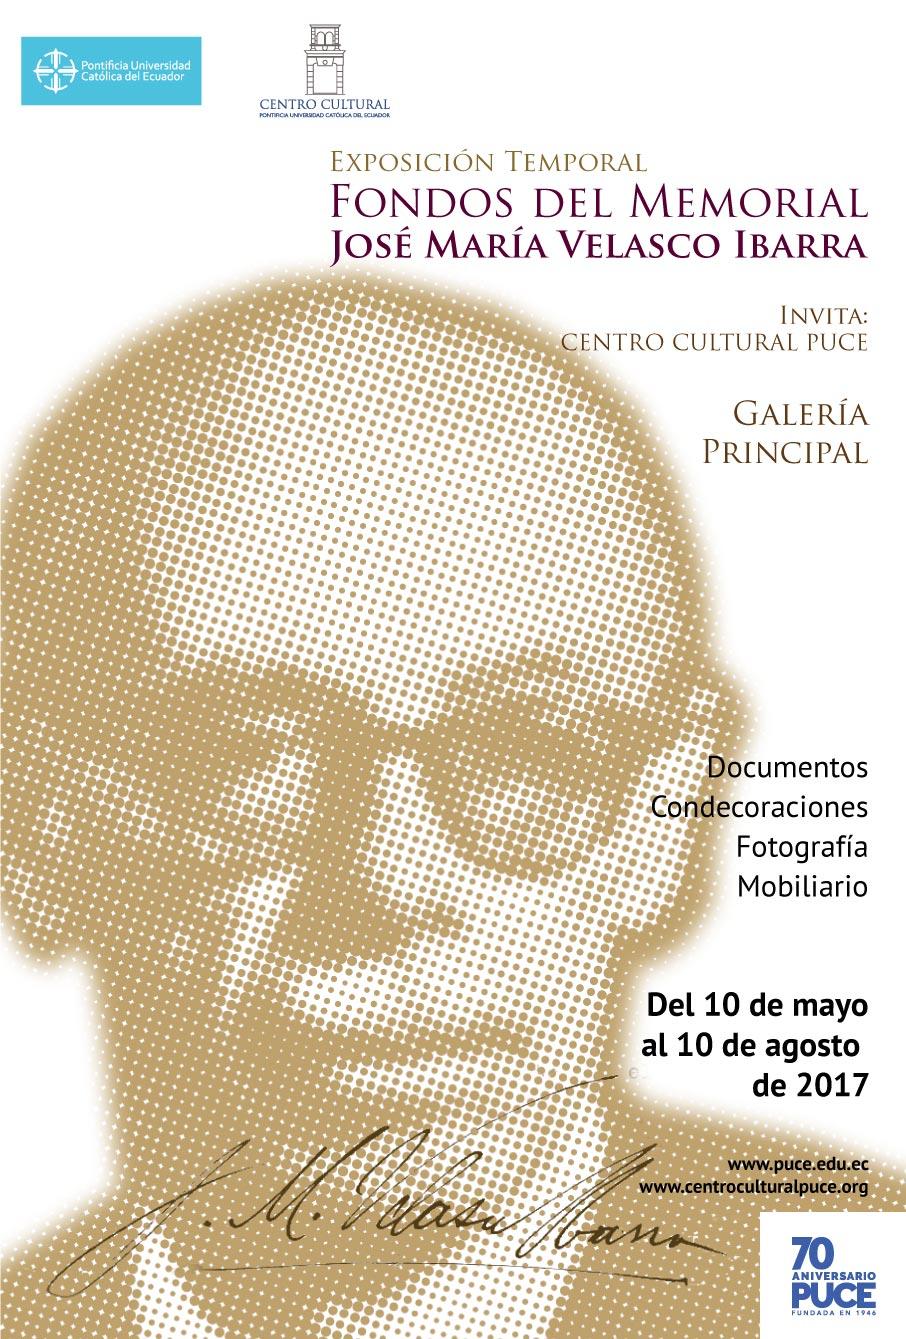 FONDOS-JOSE-MARIA-VELASCO-IBARRA